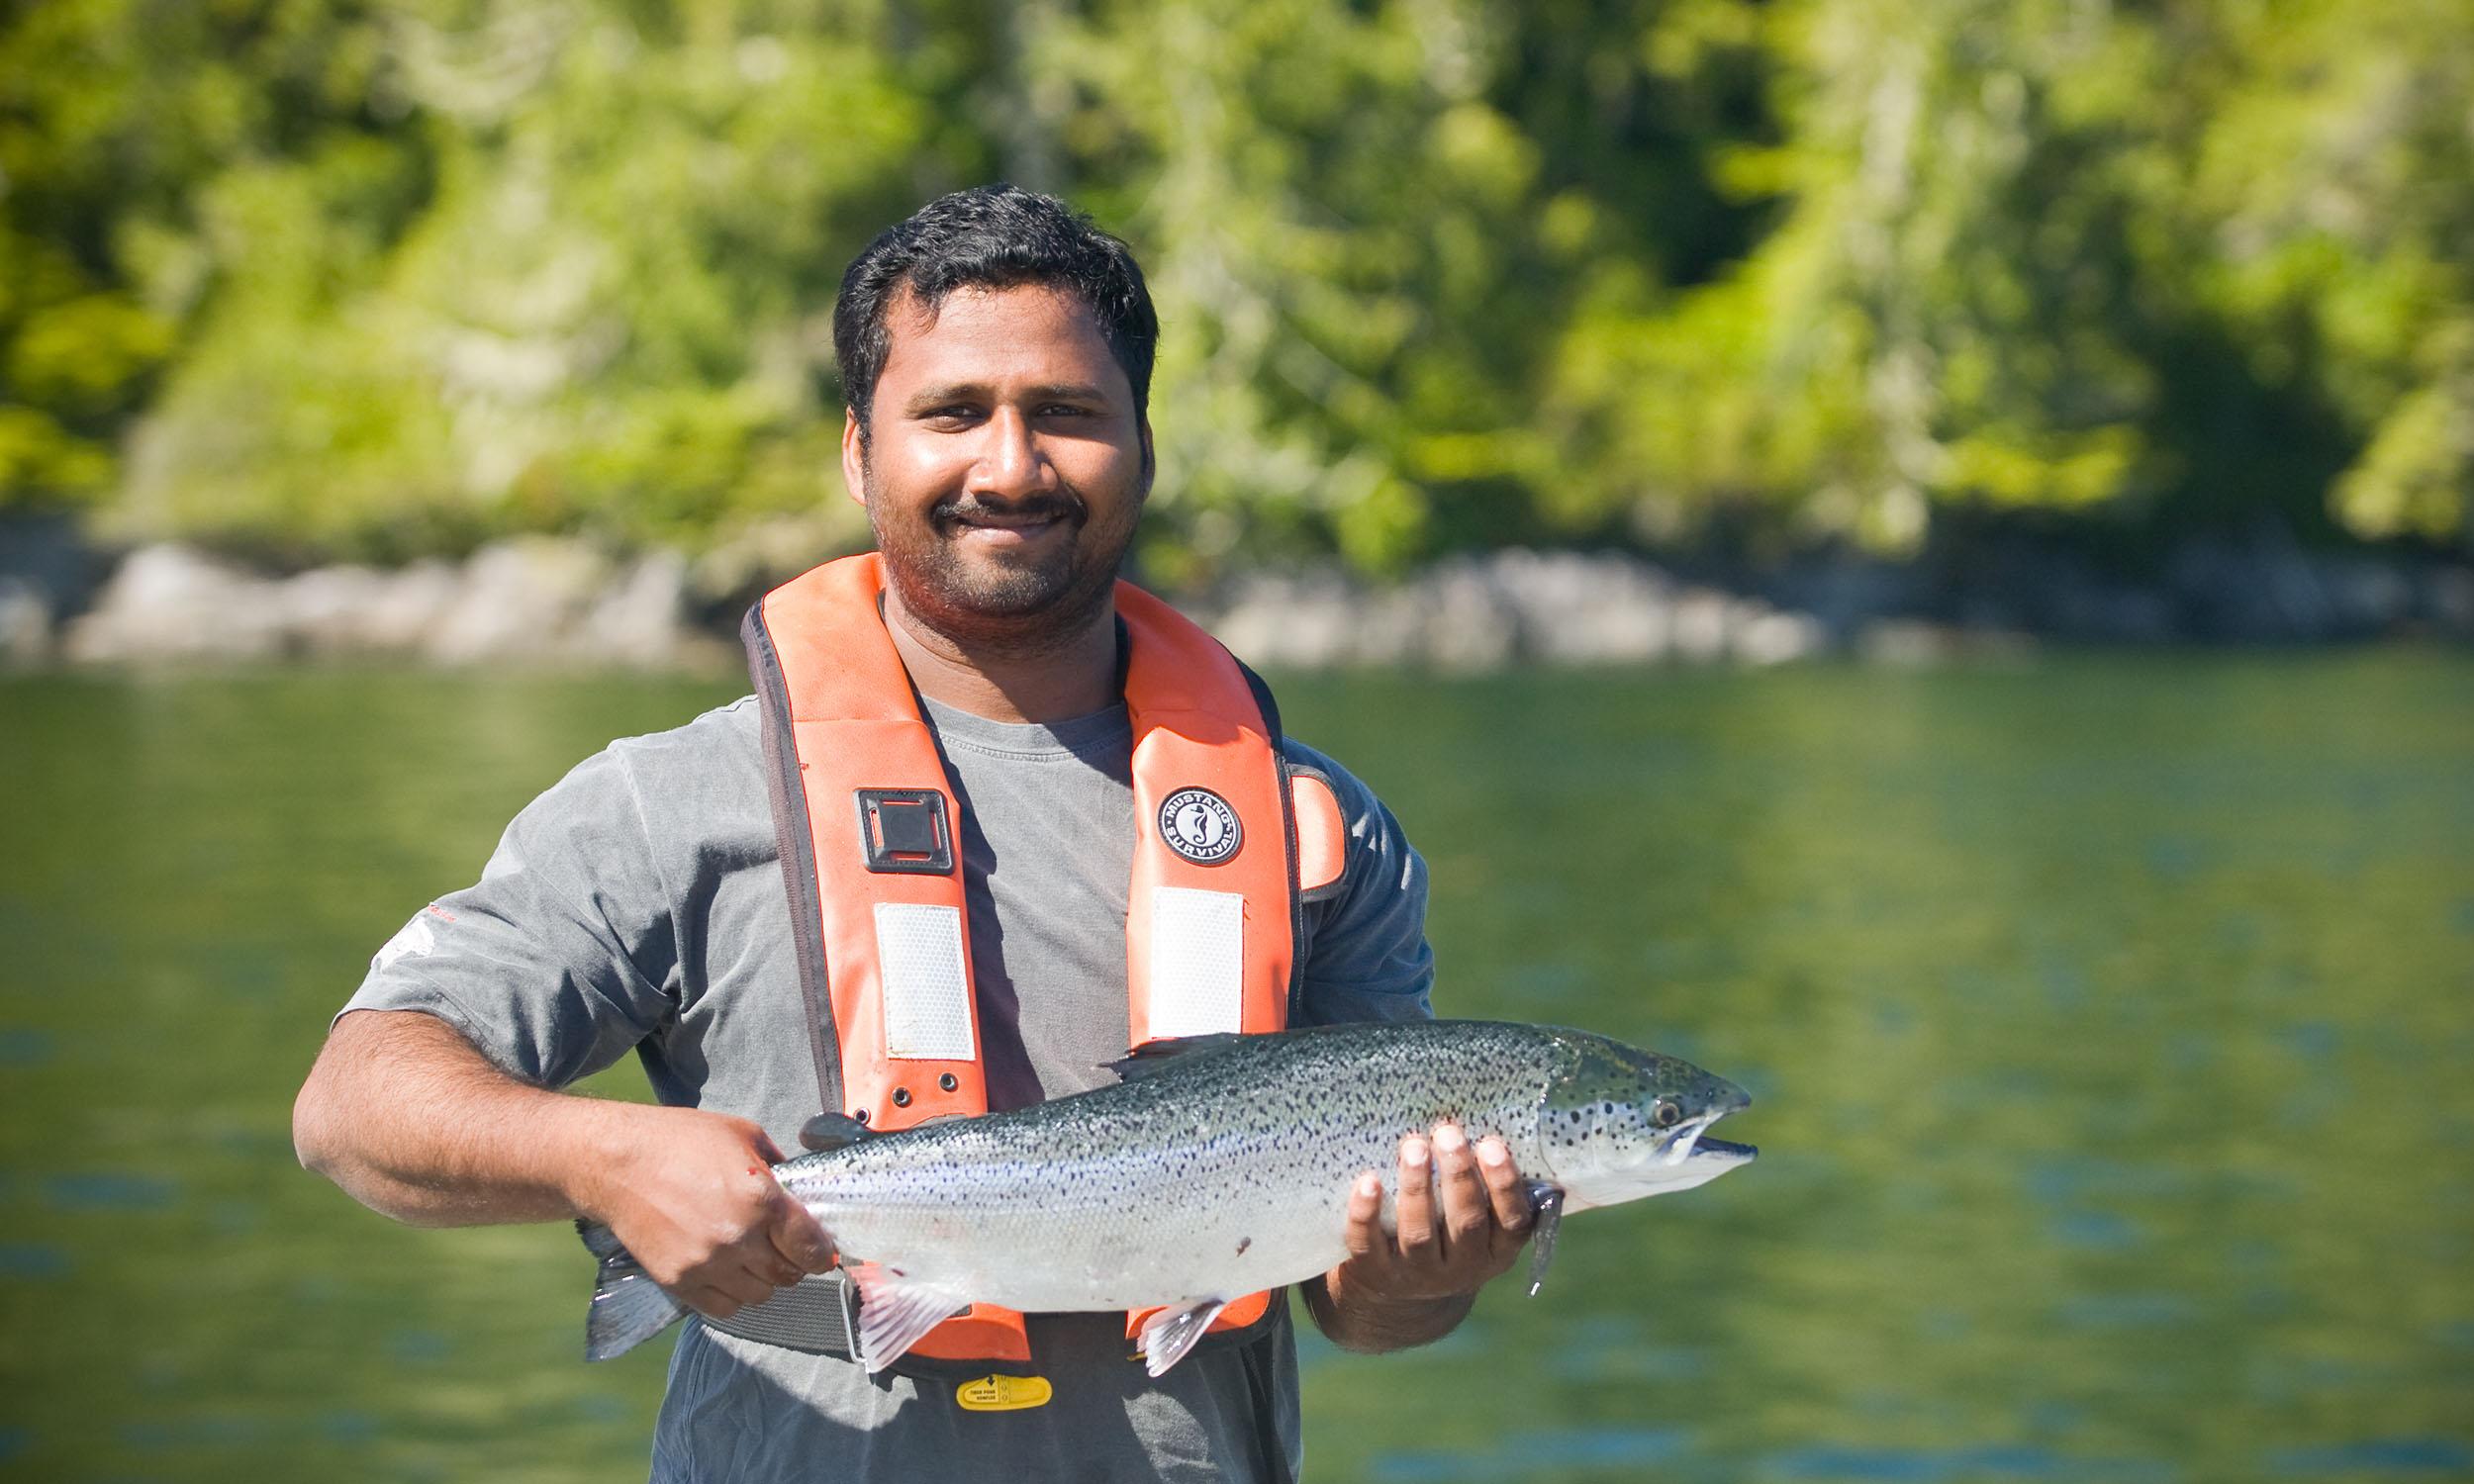 MHC employee adult salmon.jpg